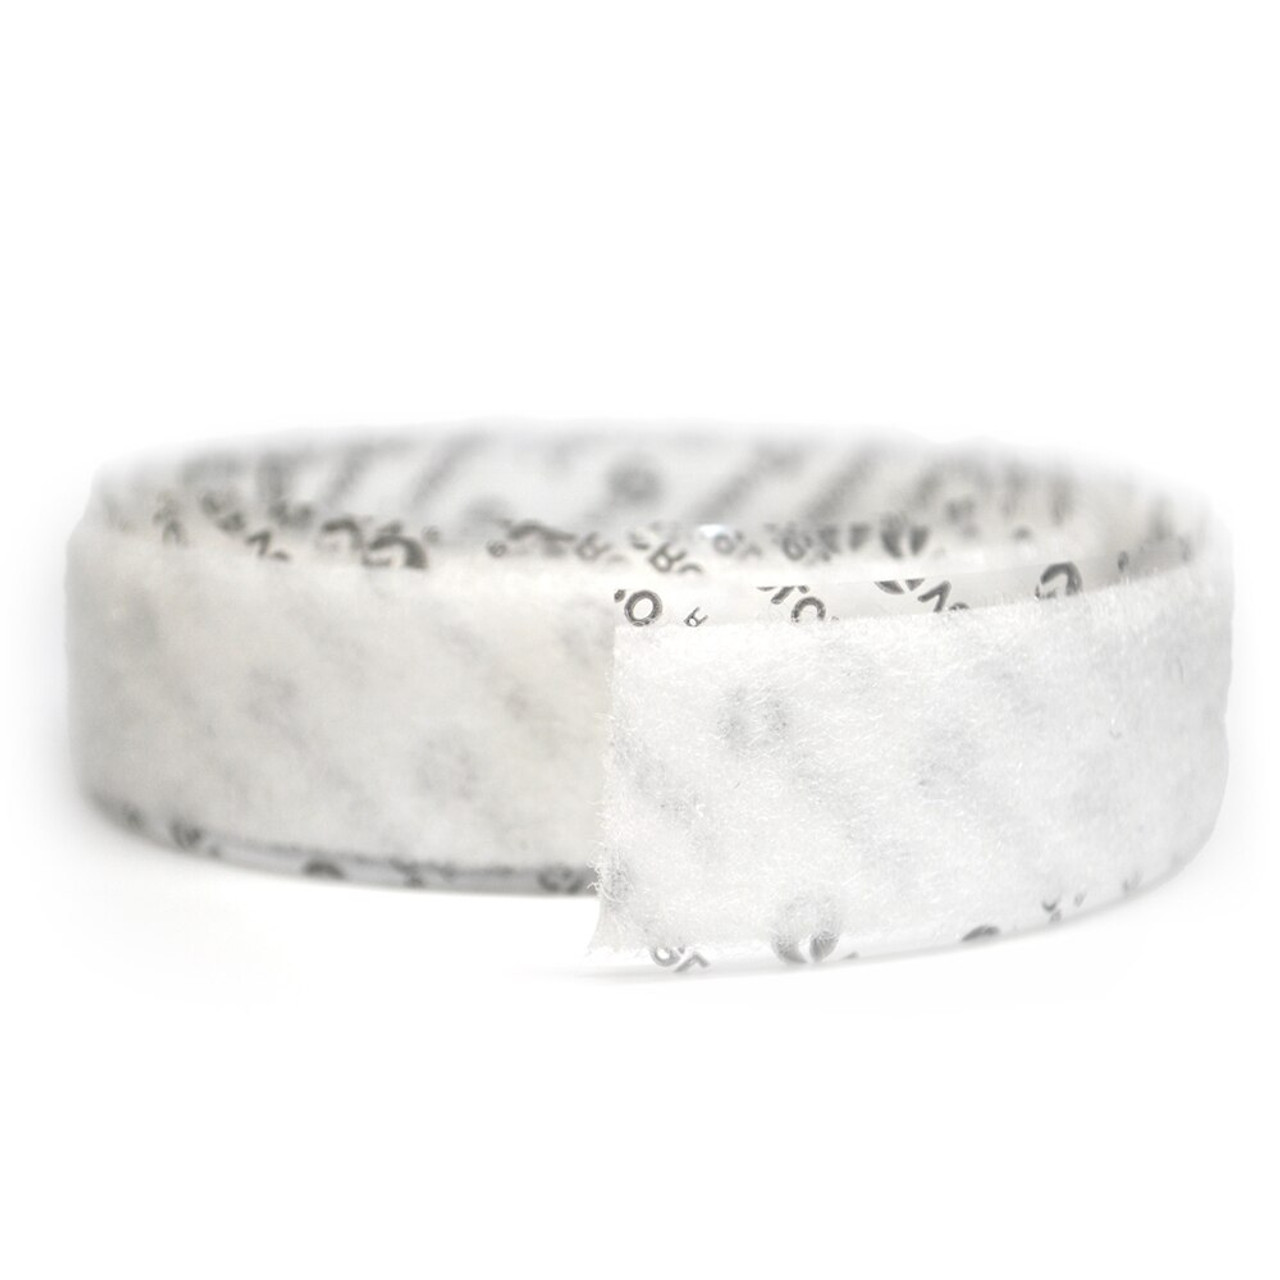 VELCRO® Brand Polyester Tape White Loop